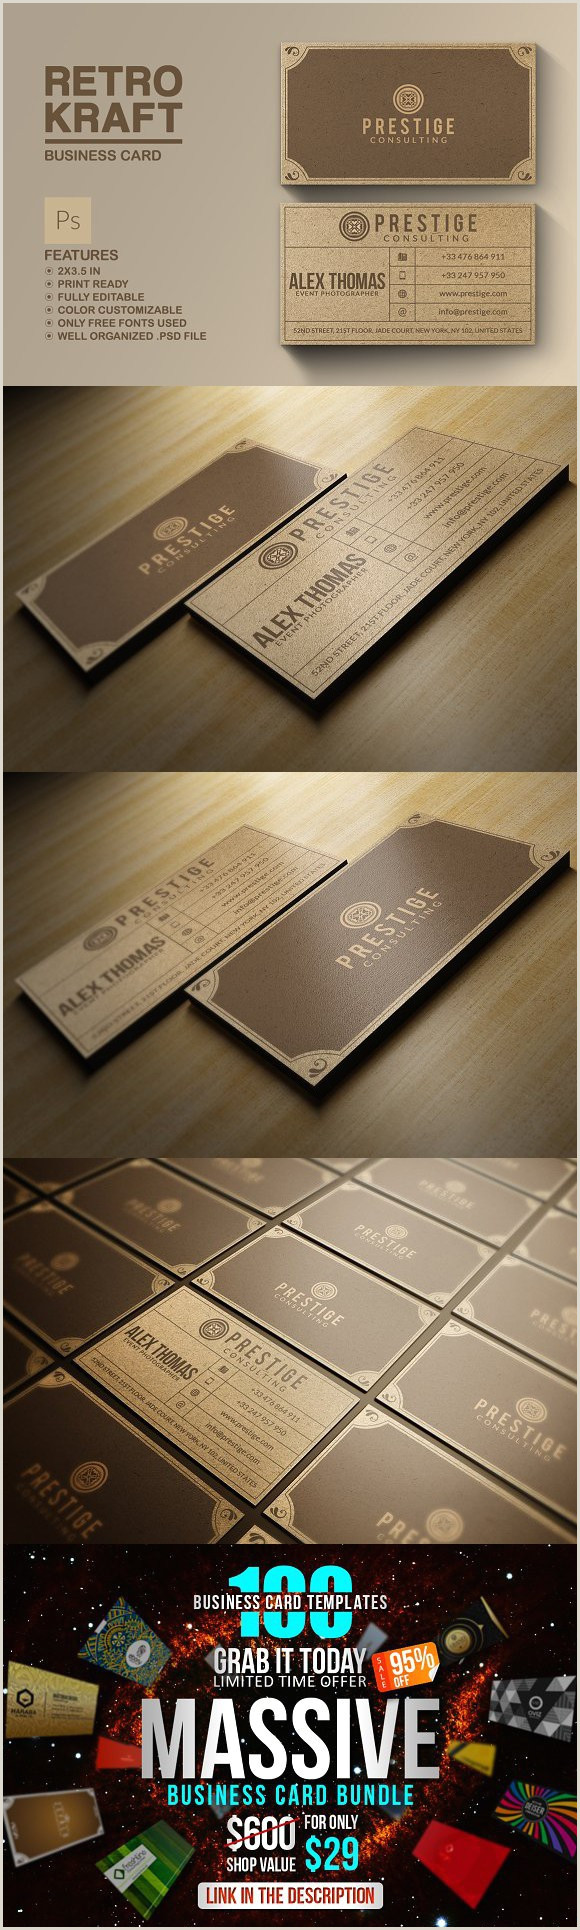 Unique Way To Organize Business Cards Retro Kraft Business Card